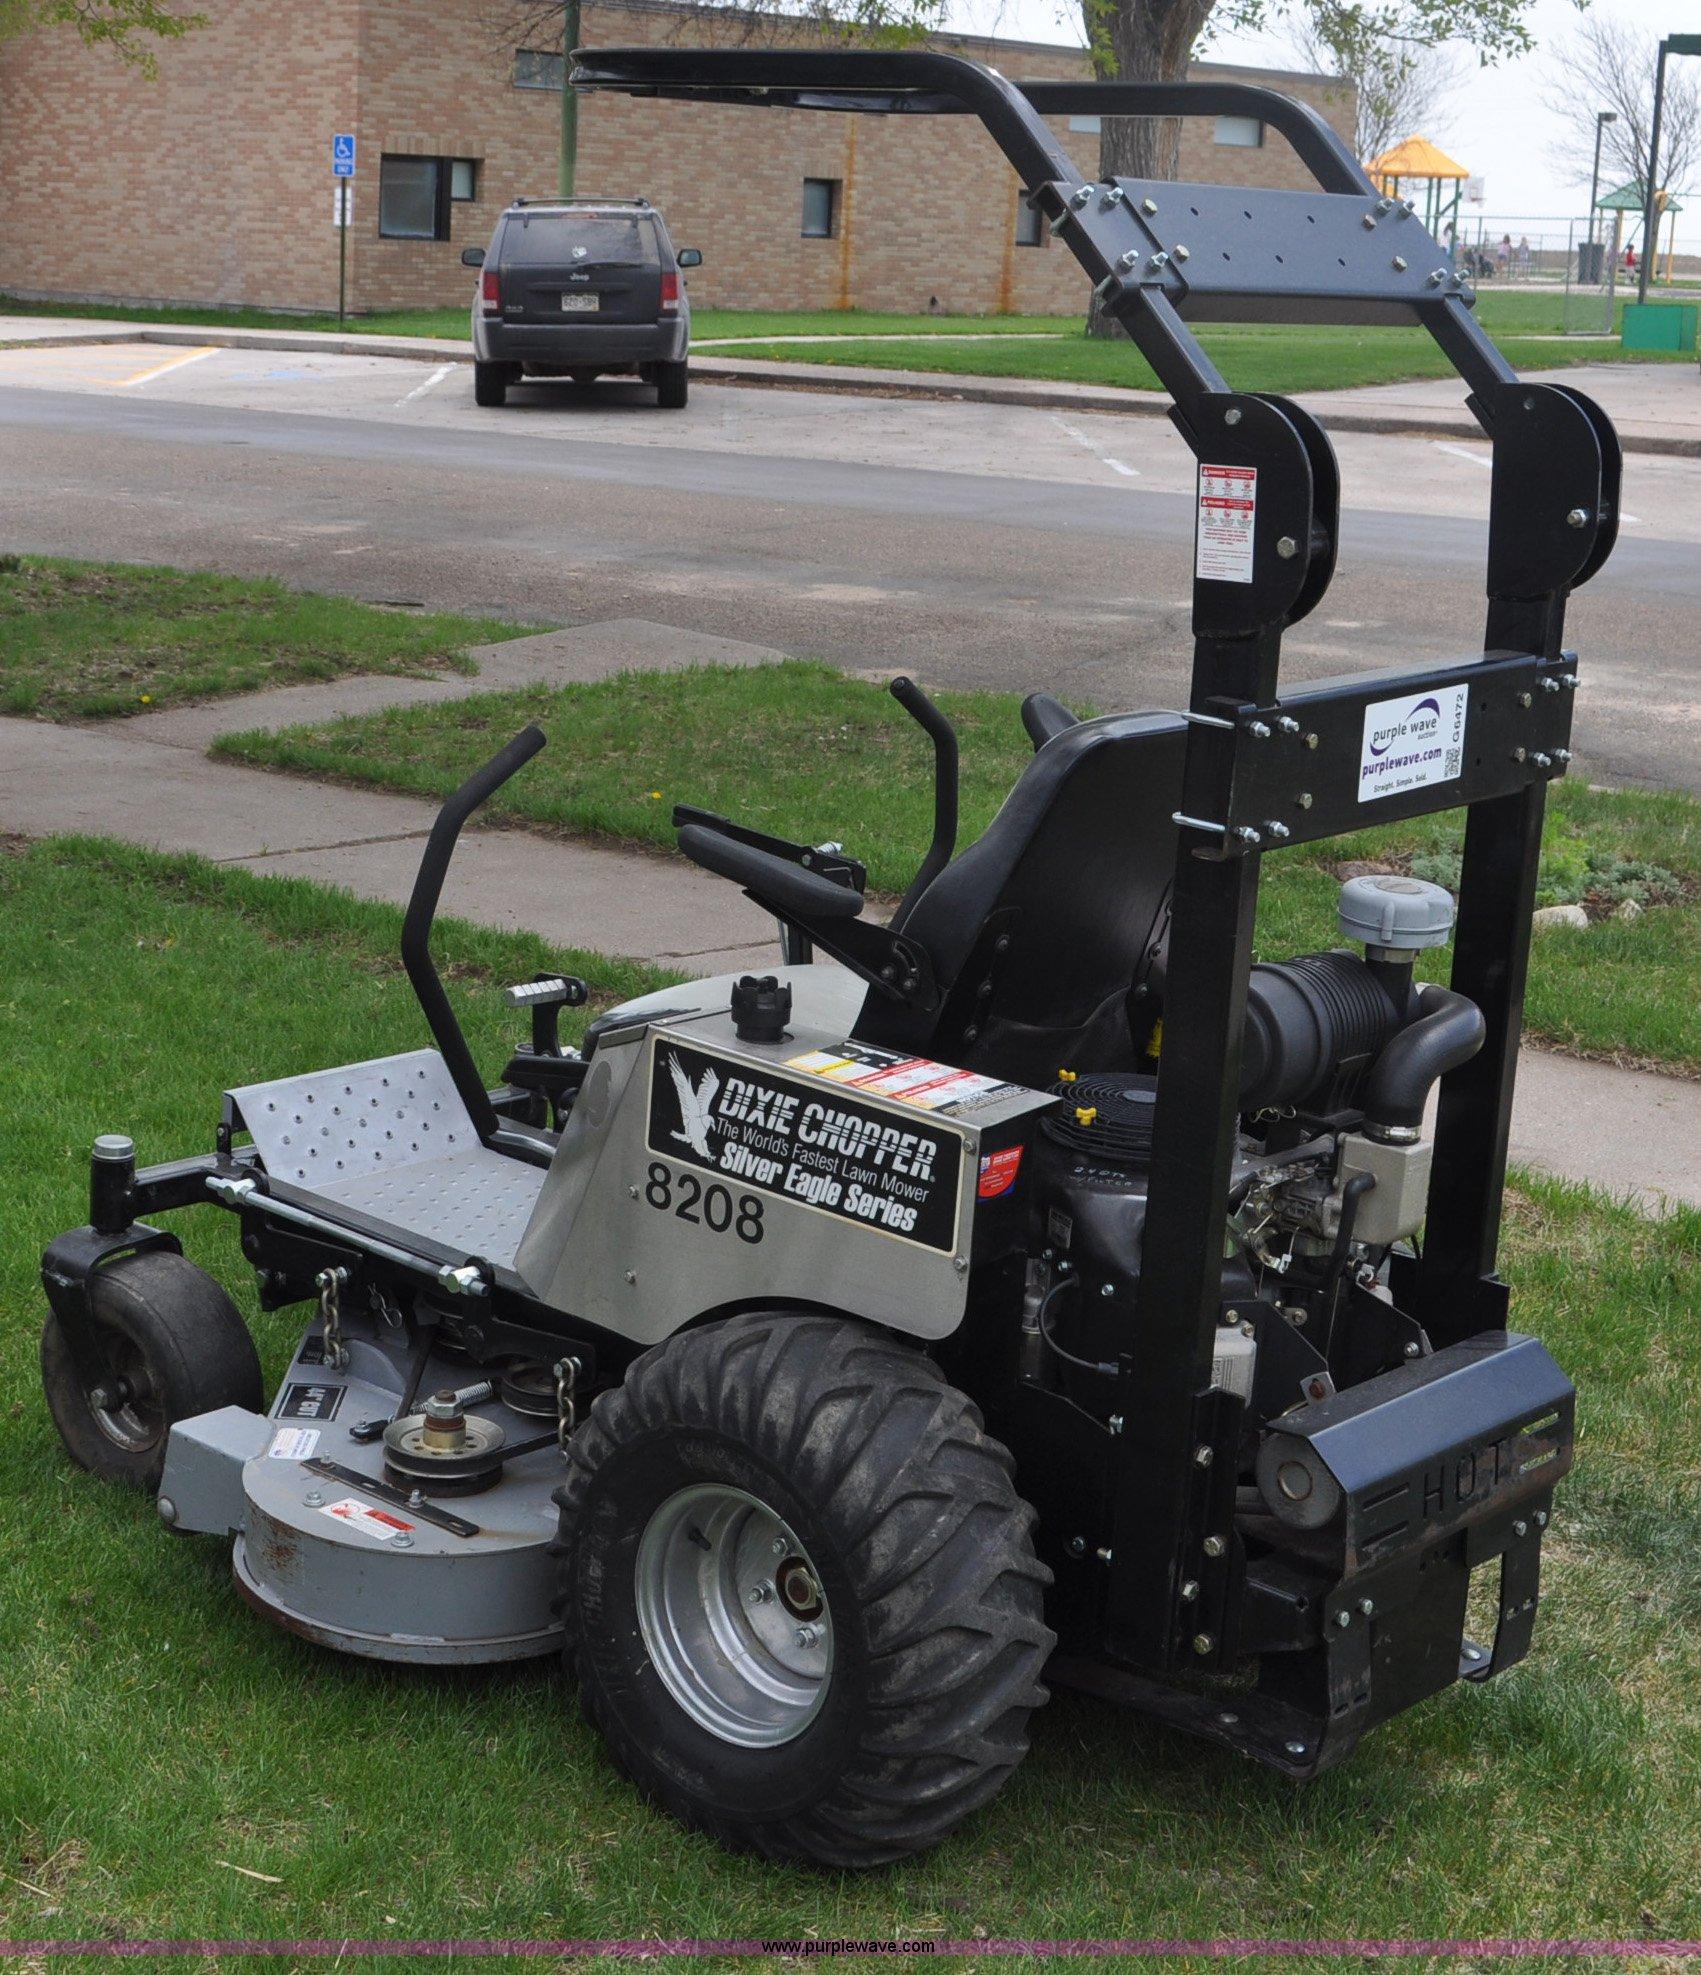 Dixie Chopper LT2700 ZTR lawn mower   Item G6472   SOLD! May